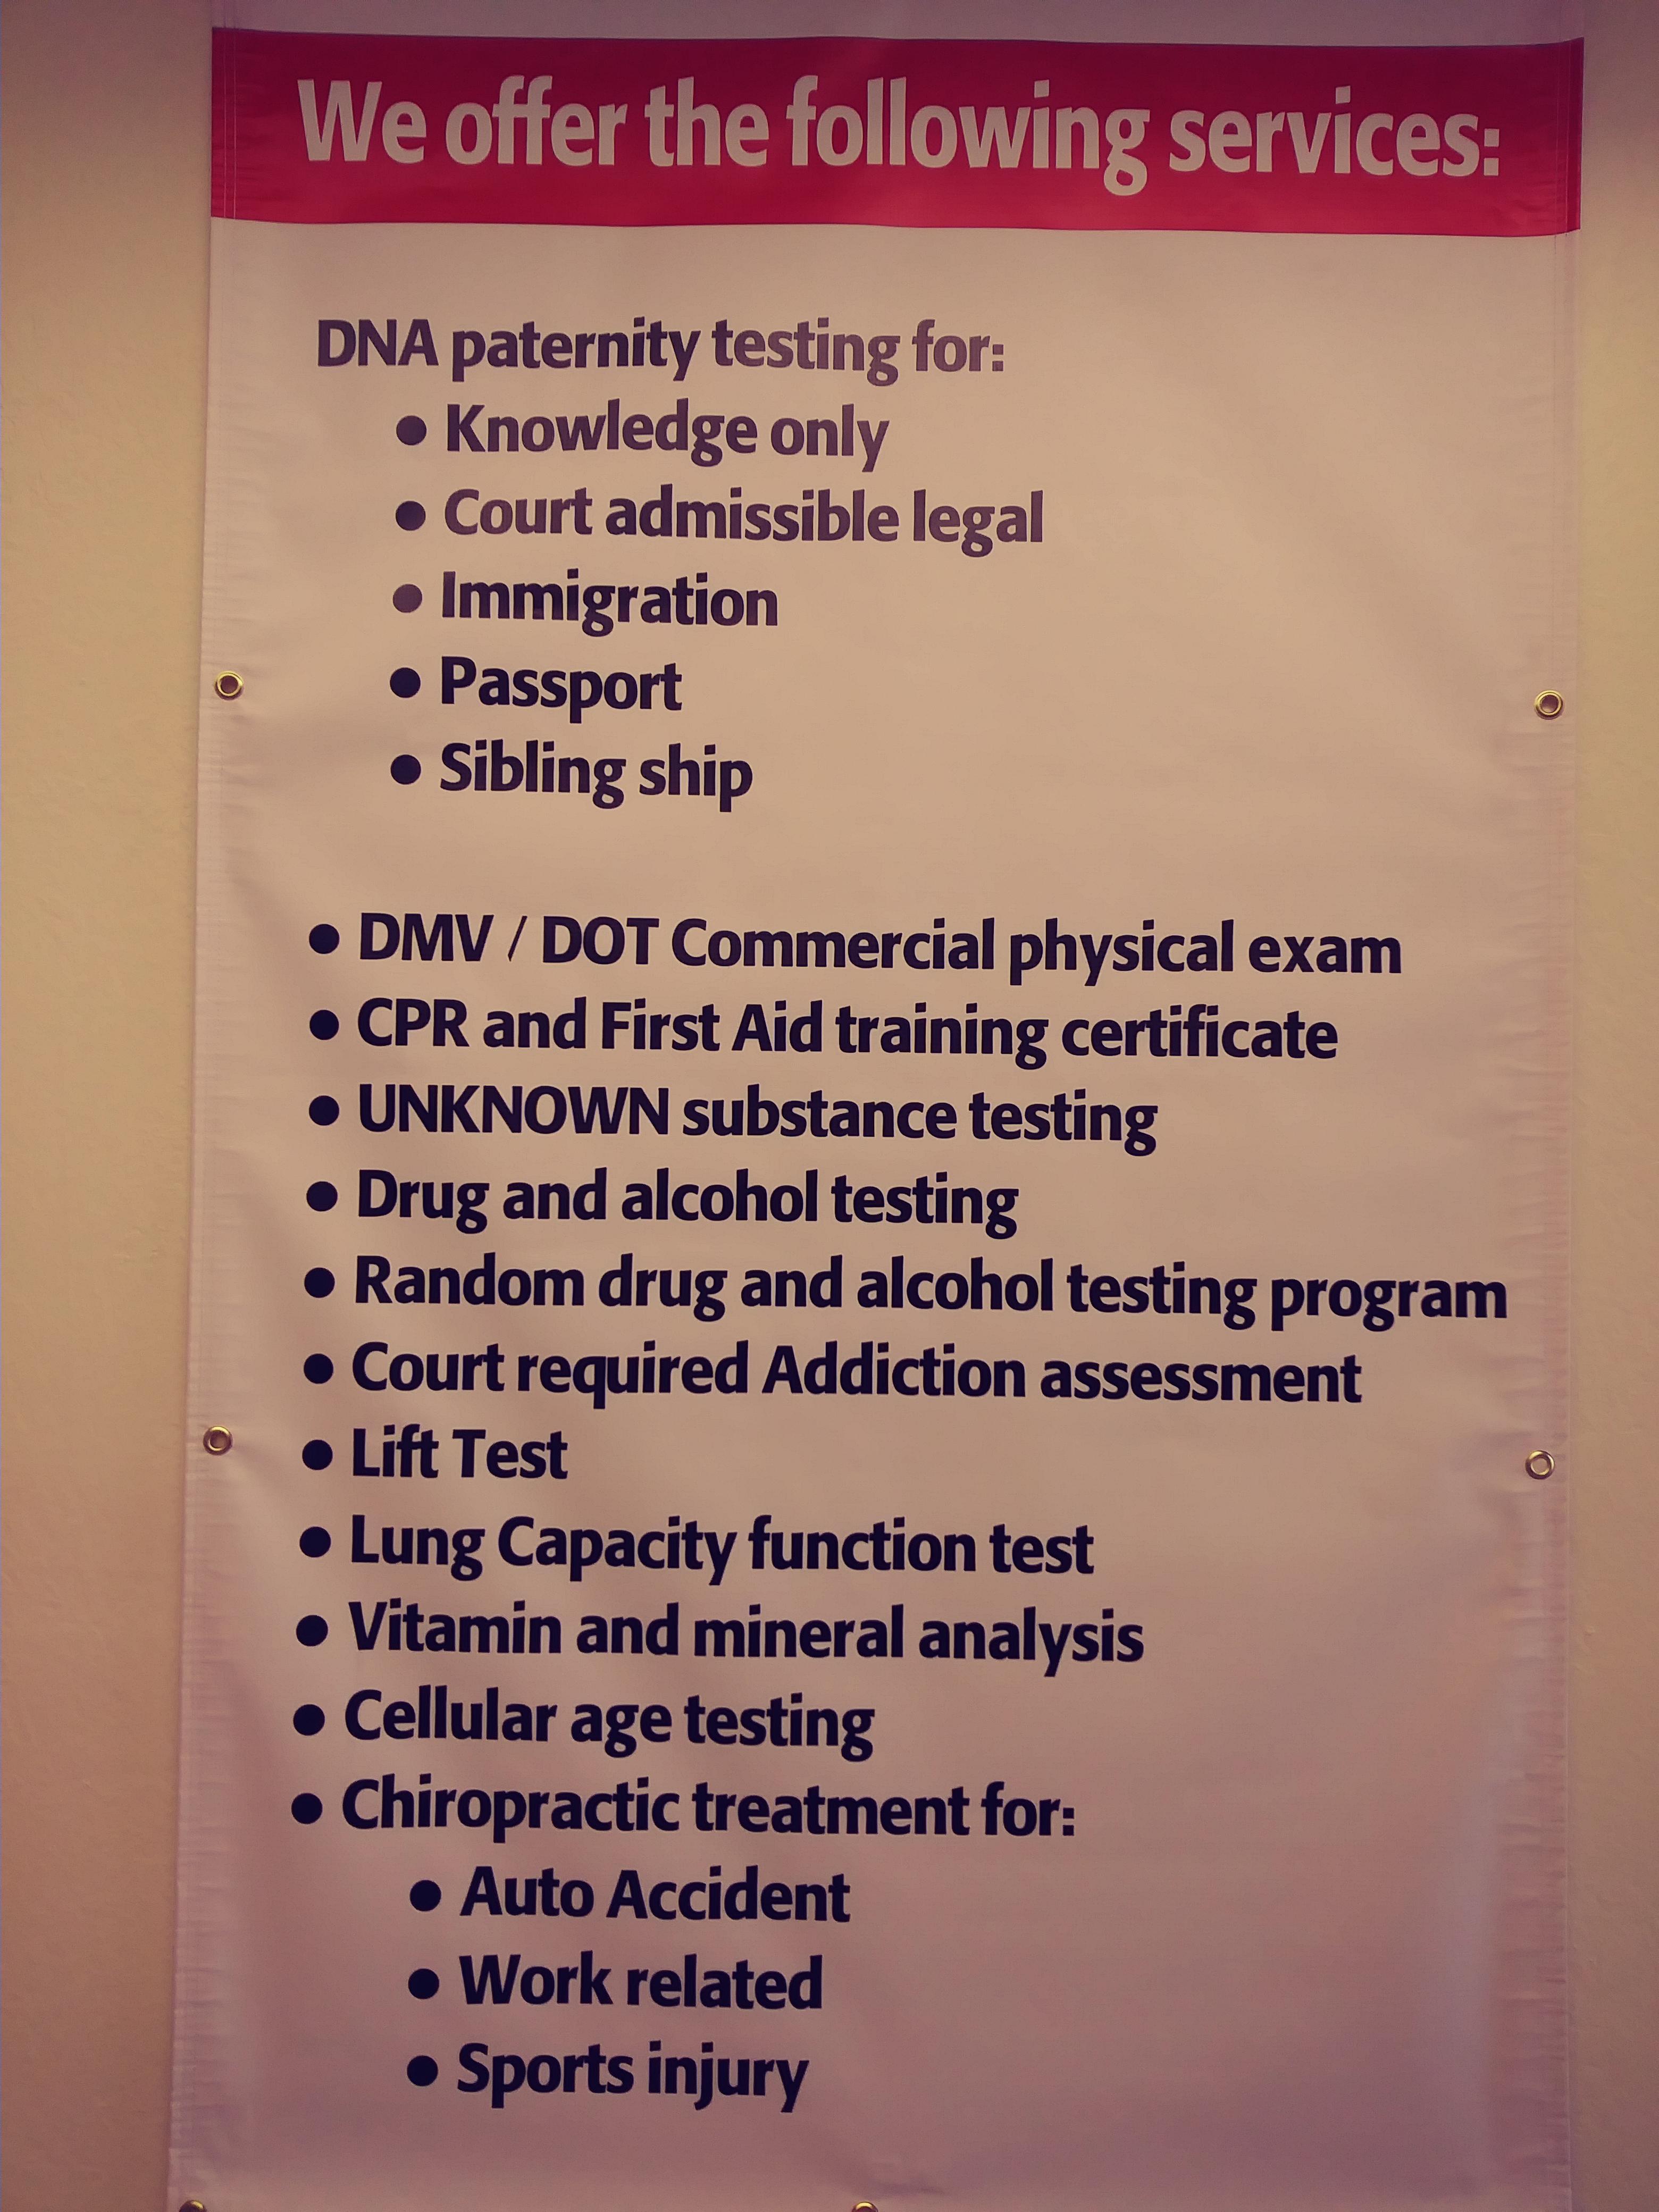 Northern California Drug Testing Clinic image 1